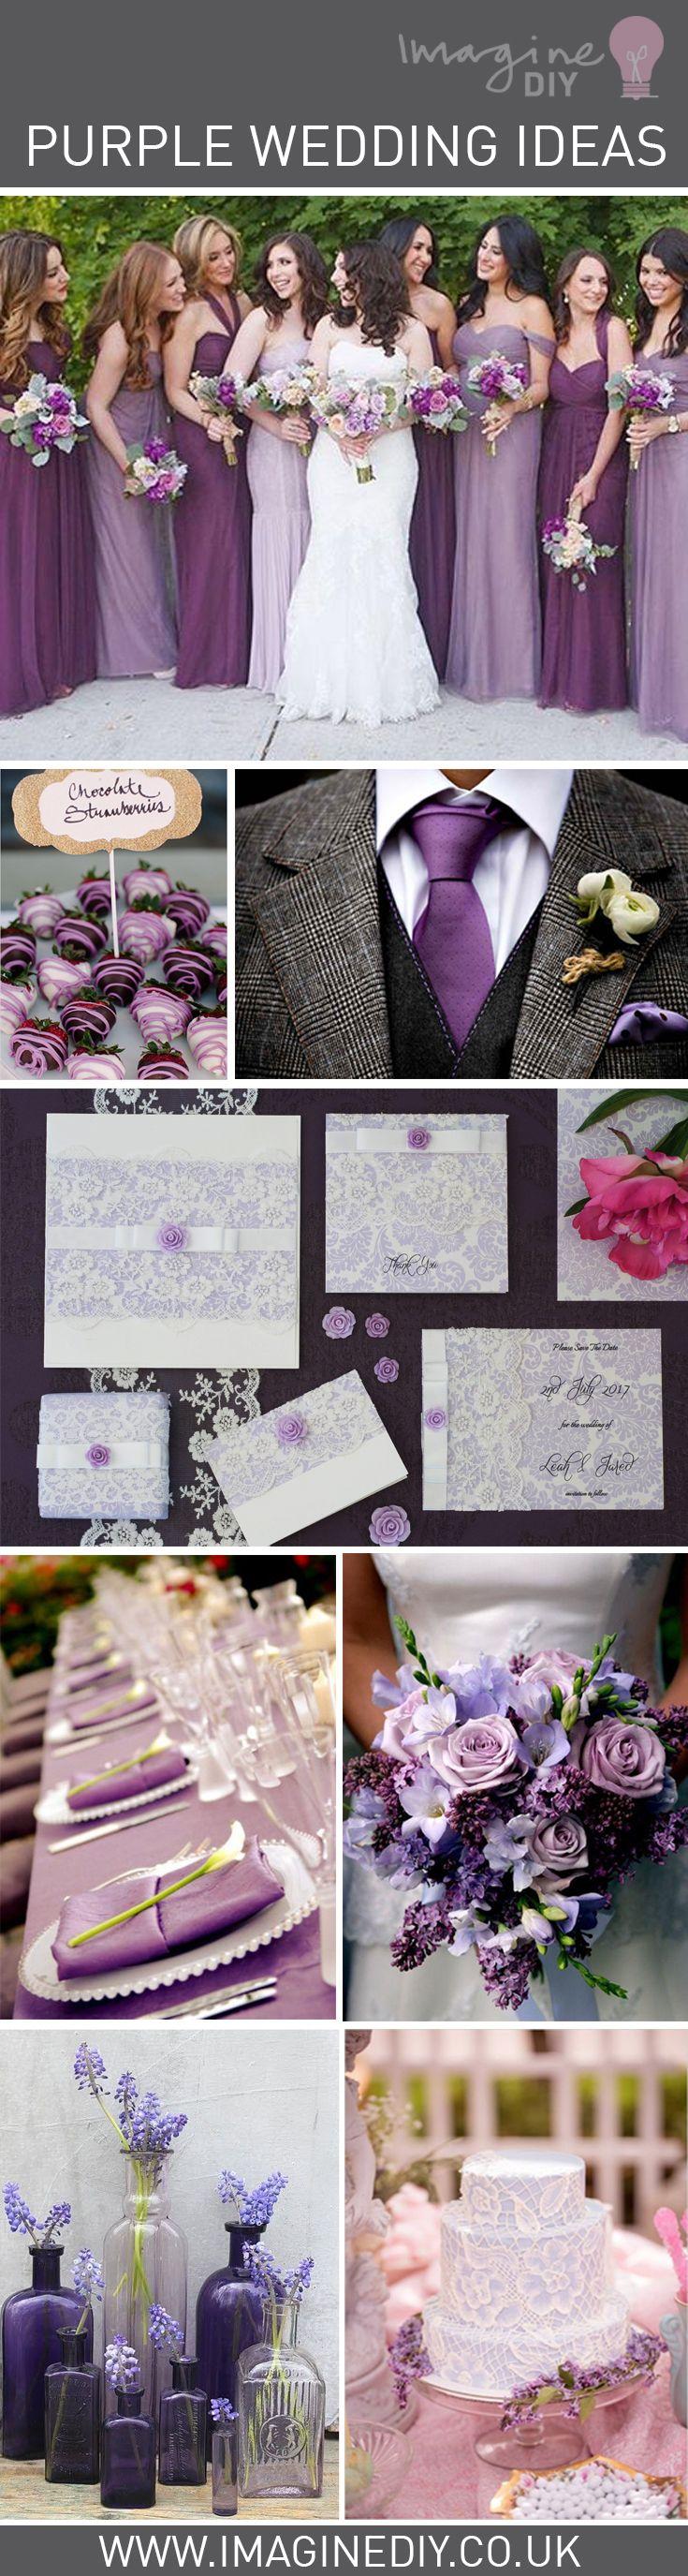 Purple wedding ideas wedding pinterest casamento madrinha e purple wedding ideas junglespirit Gallery